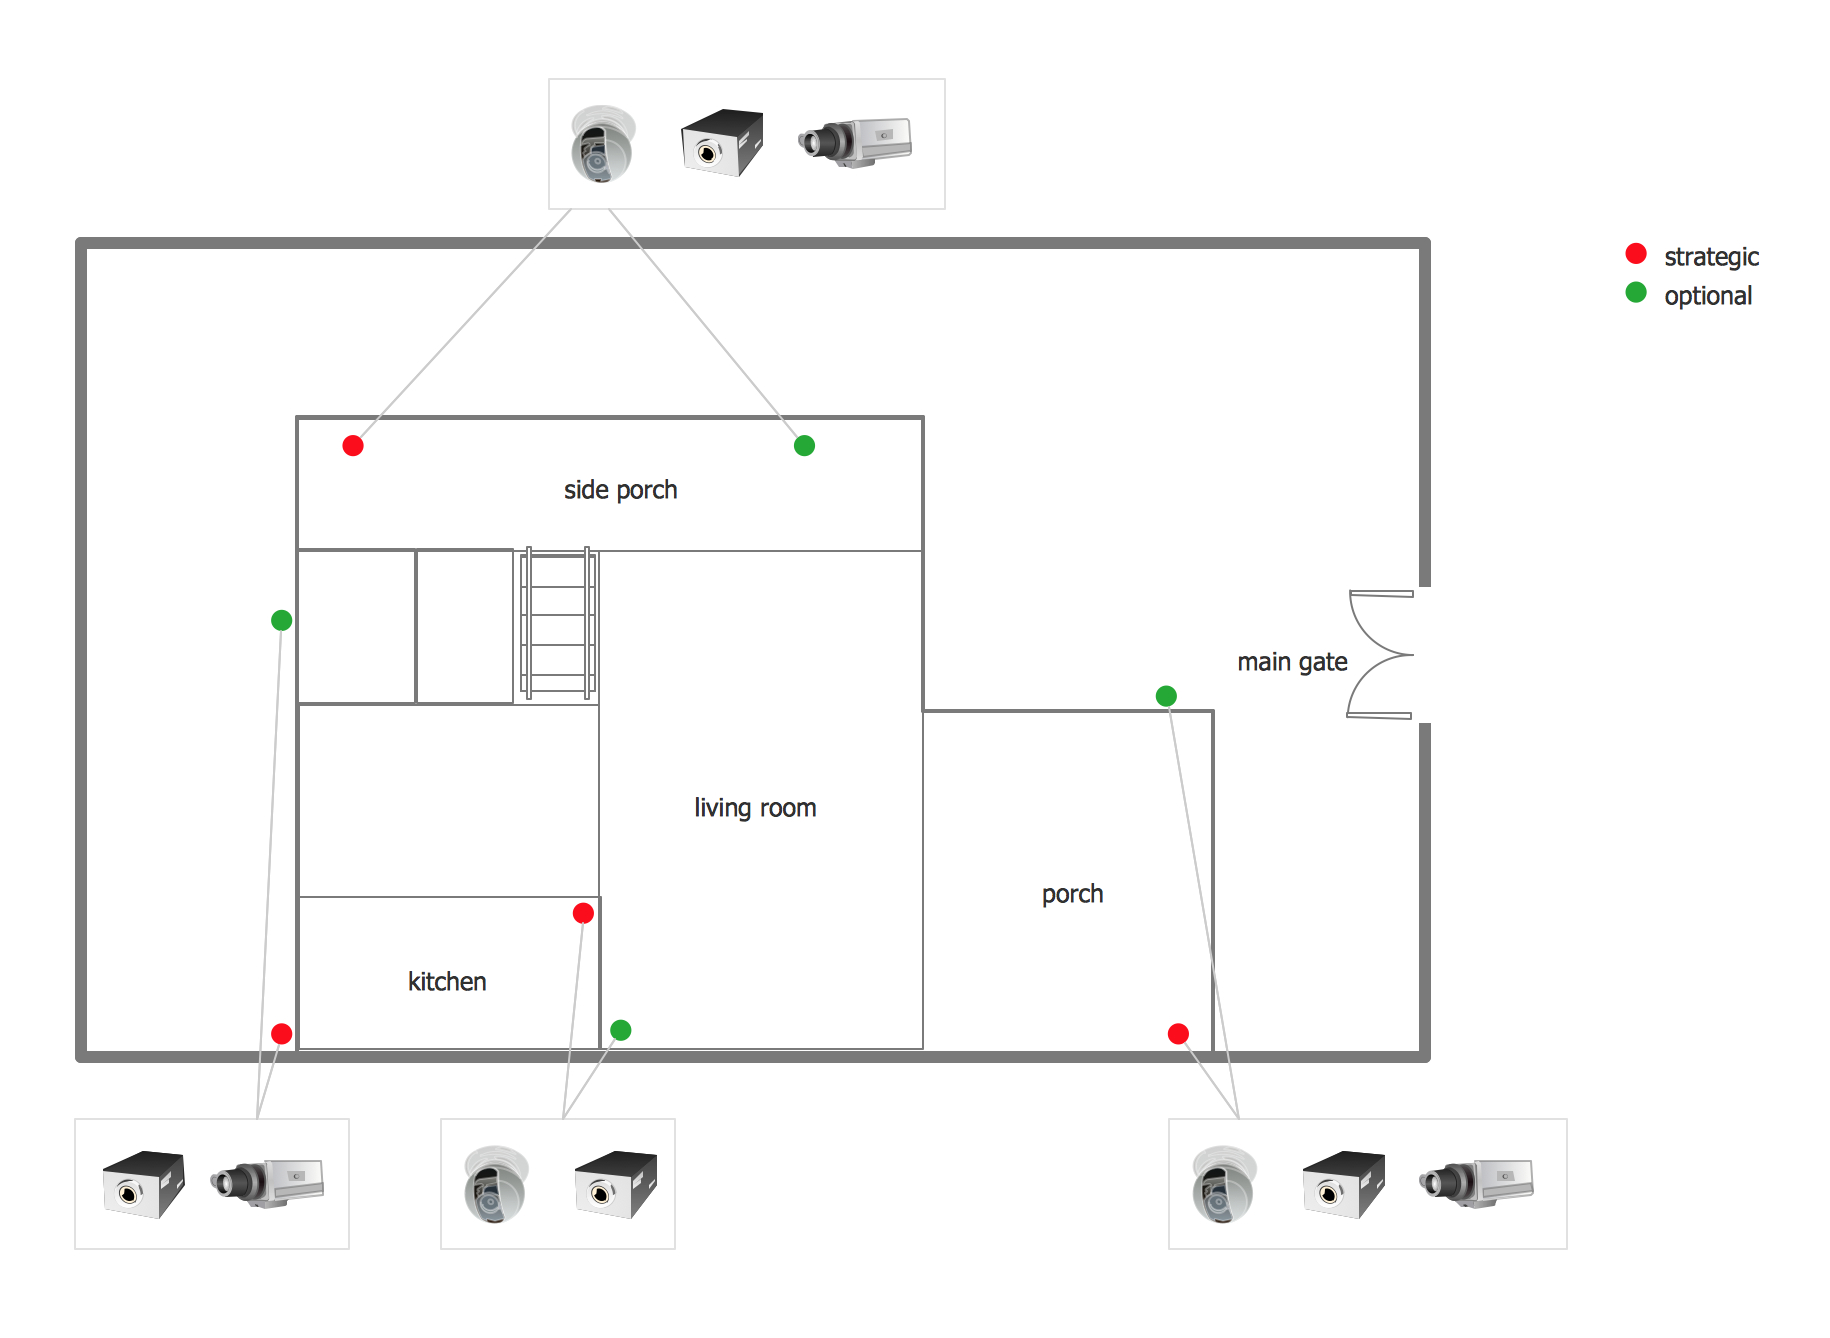 How To Create Cctv Network Diagram | Cctv Surveillance System - Cctv Camera Wiring Diagram